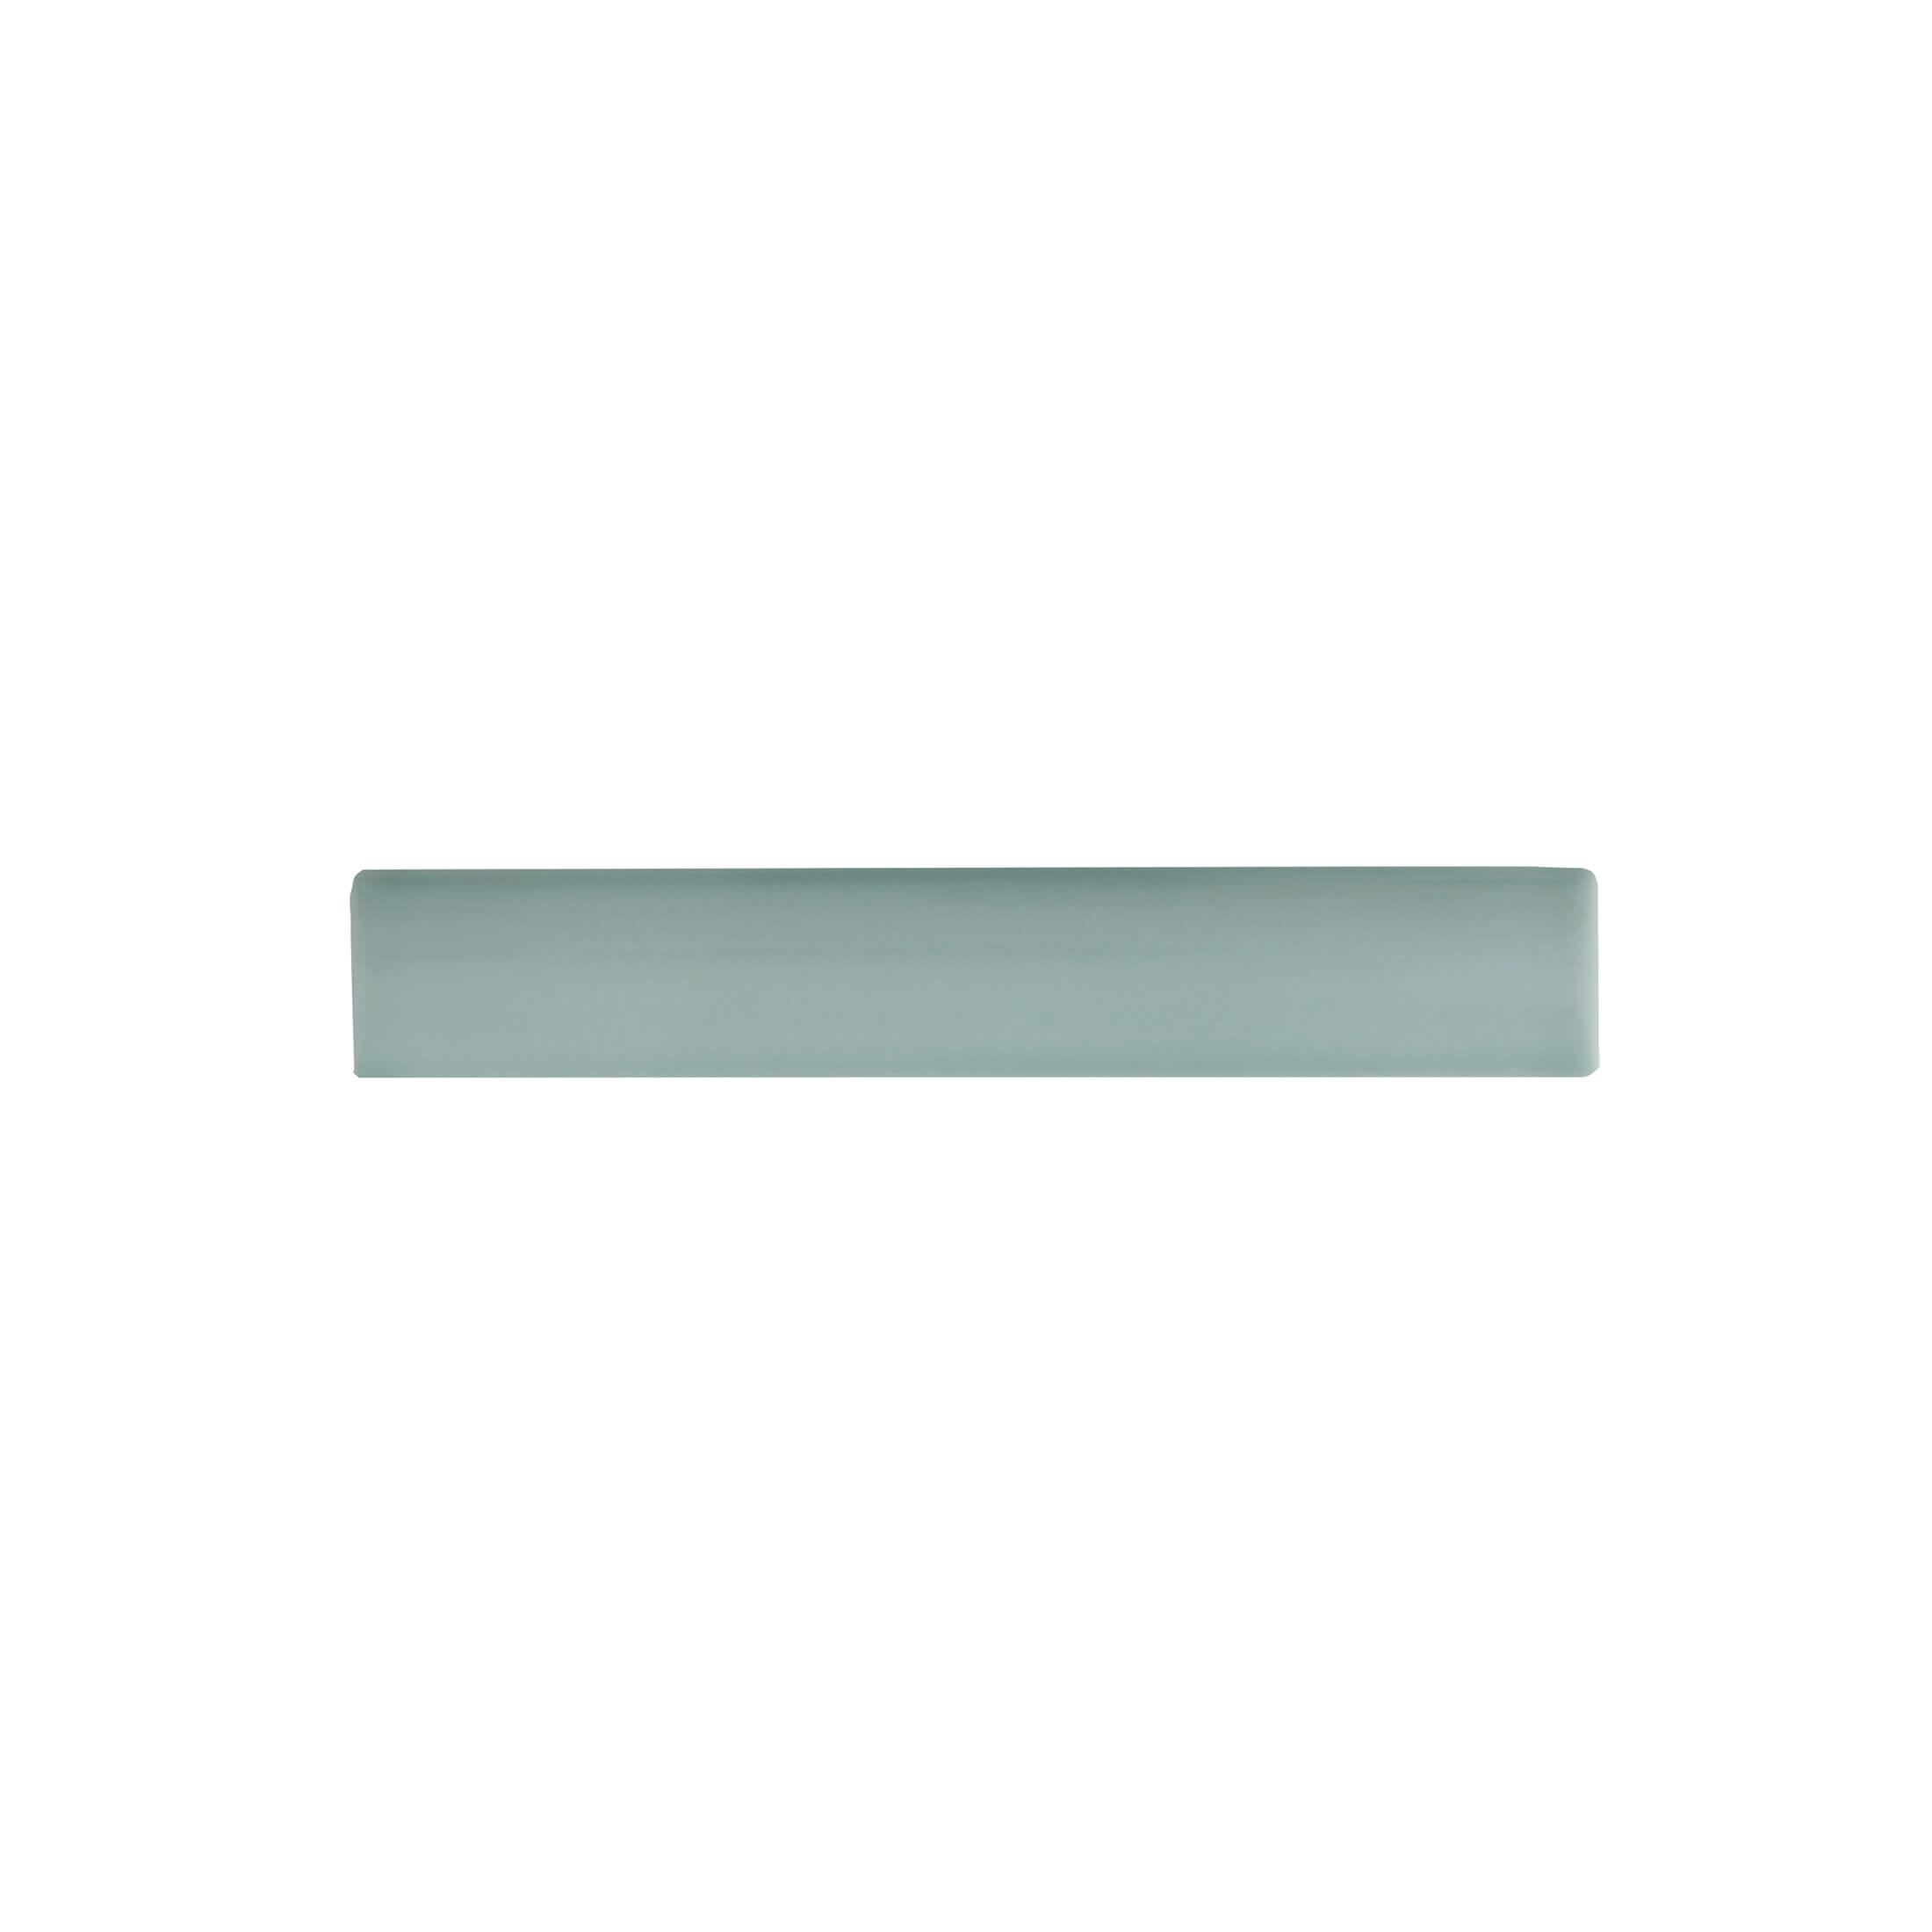 ADNE5613 - BARRA LISA - 3 cm X 20 cm